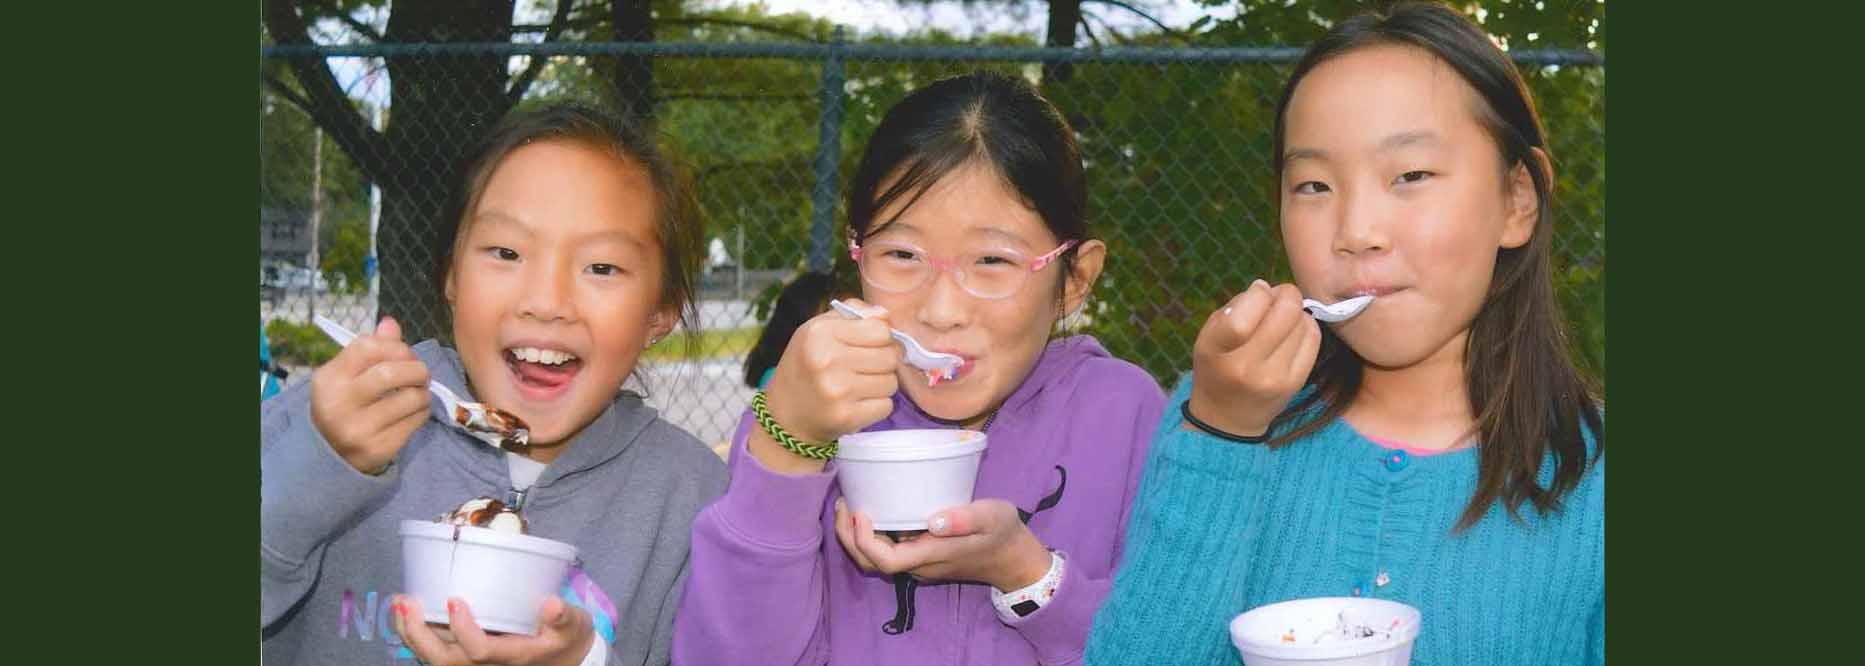 Three Upham Students Eating Ice Cream